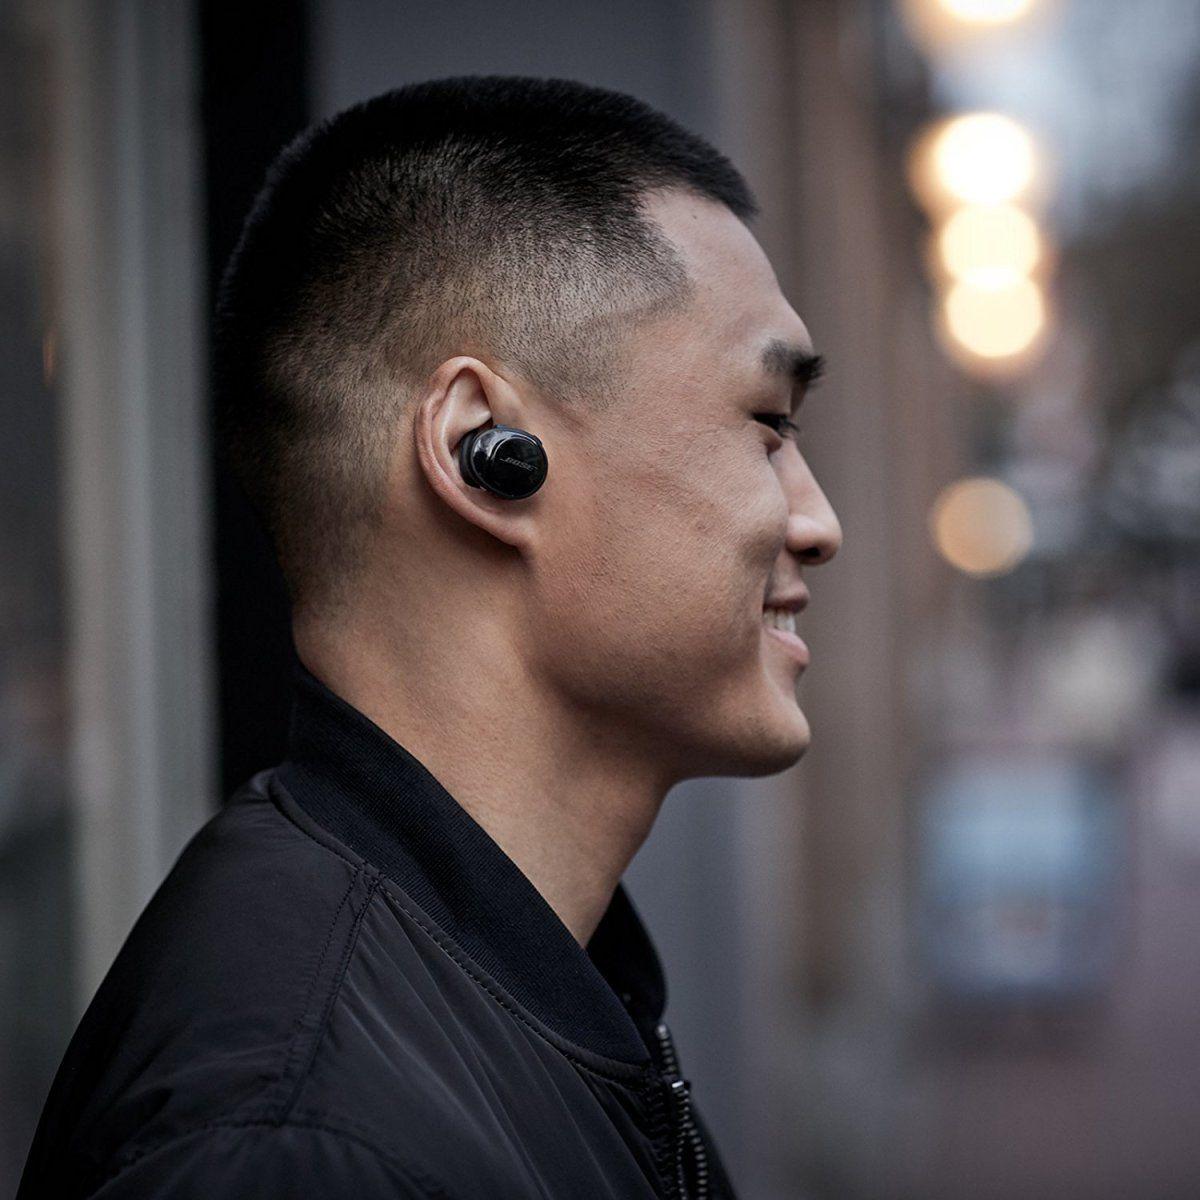 Pin On Headset